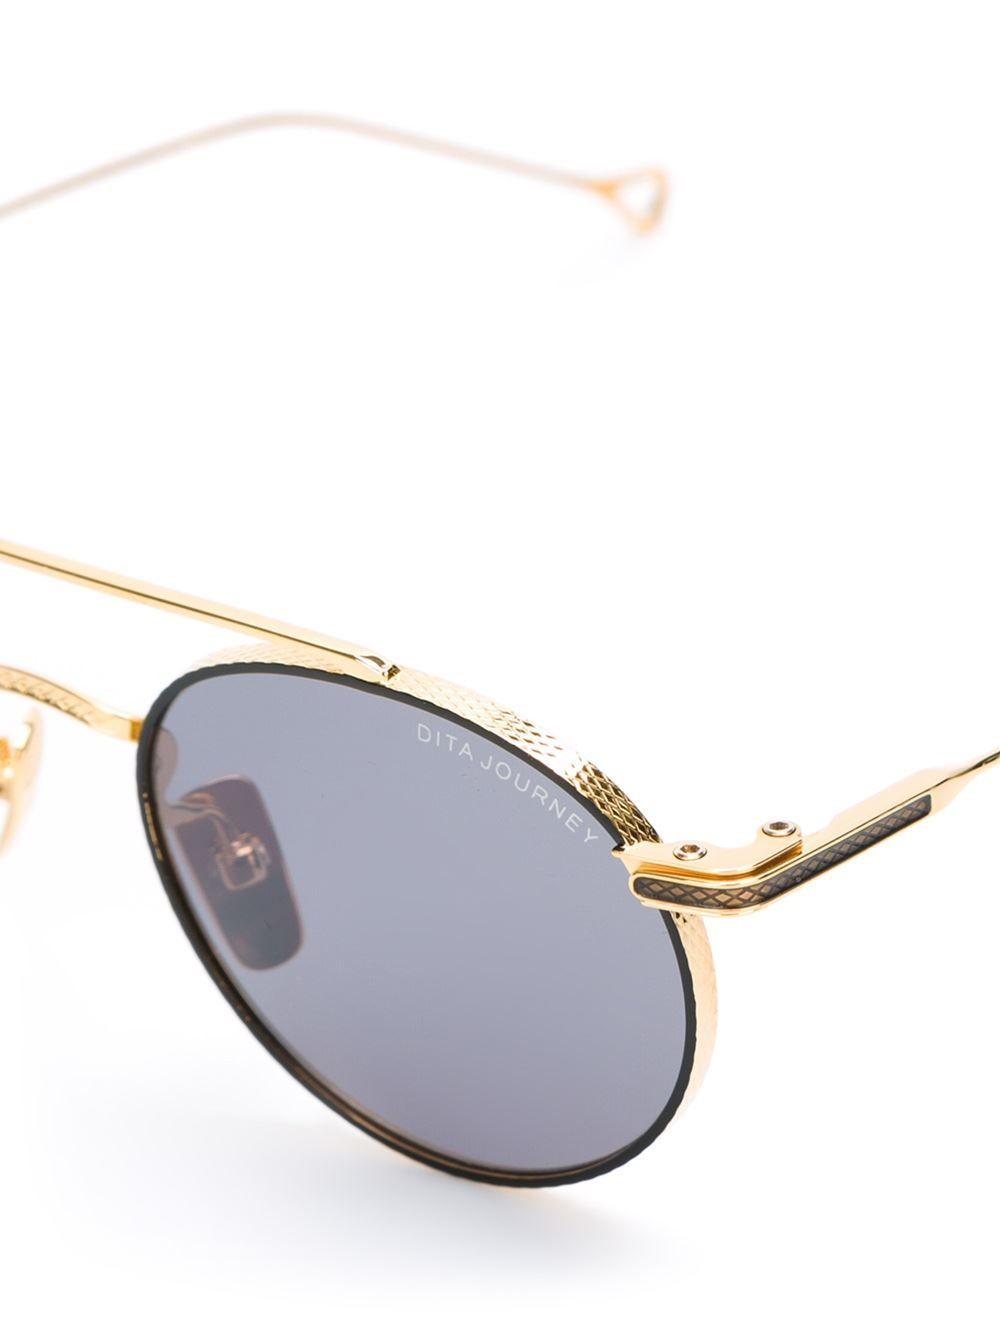 5835662dc25 Dita Eyewear Round Frame Sunglasses - - Farfetch.com Round Frame Sunglasses